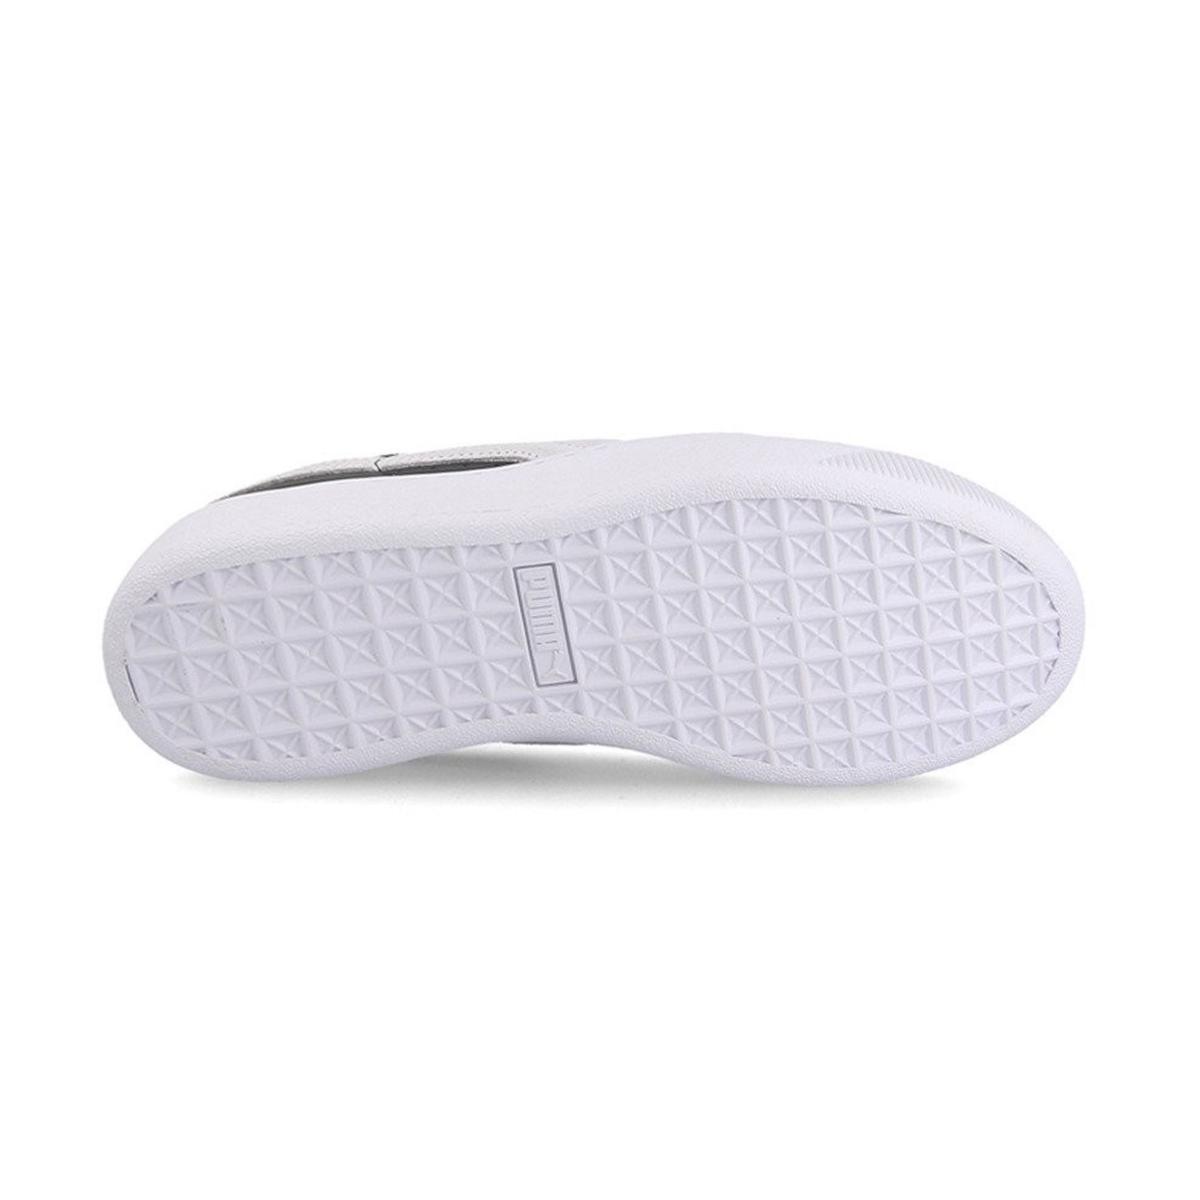 Scarpe Sneakers Puma Vikky Platform L da donna rif. 364893 01